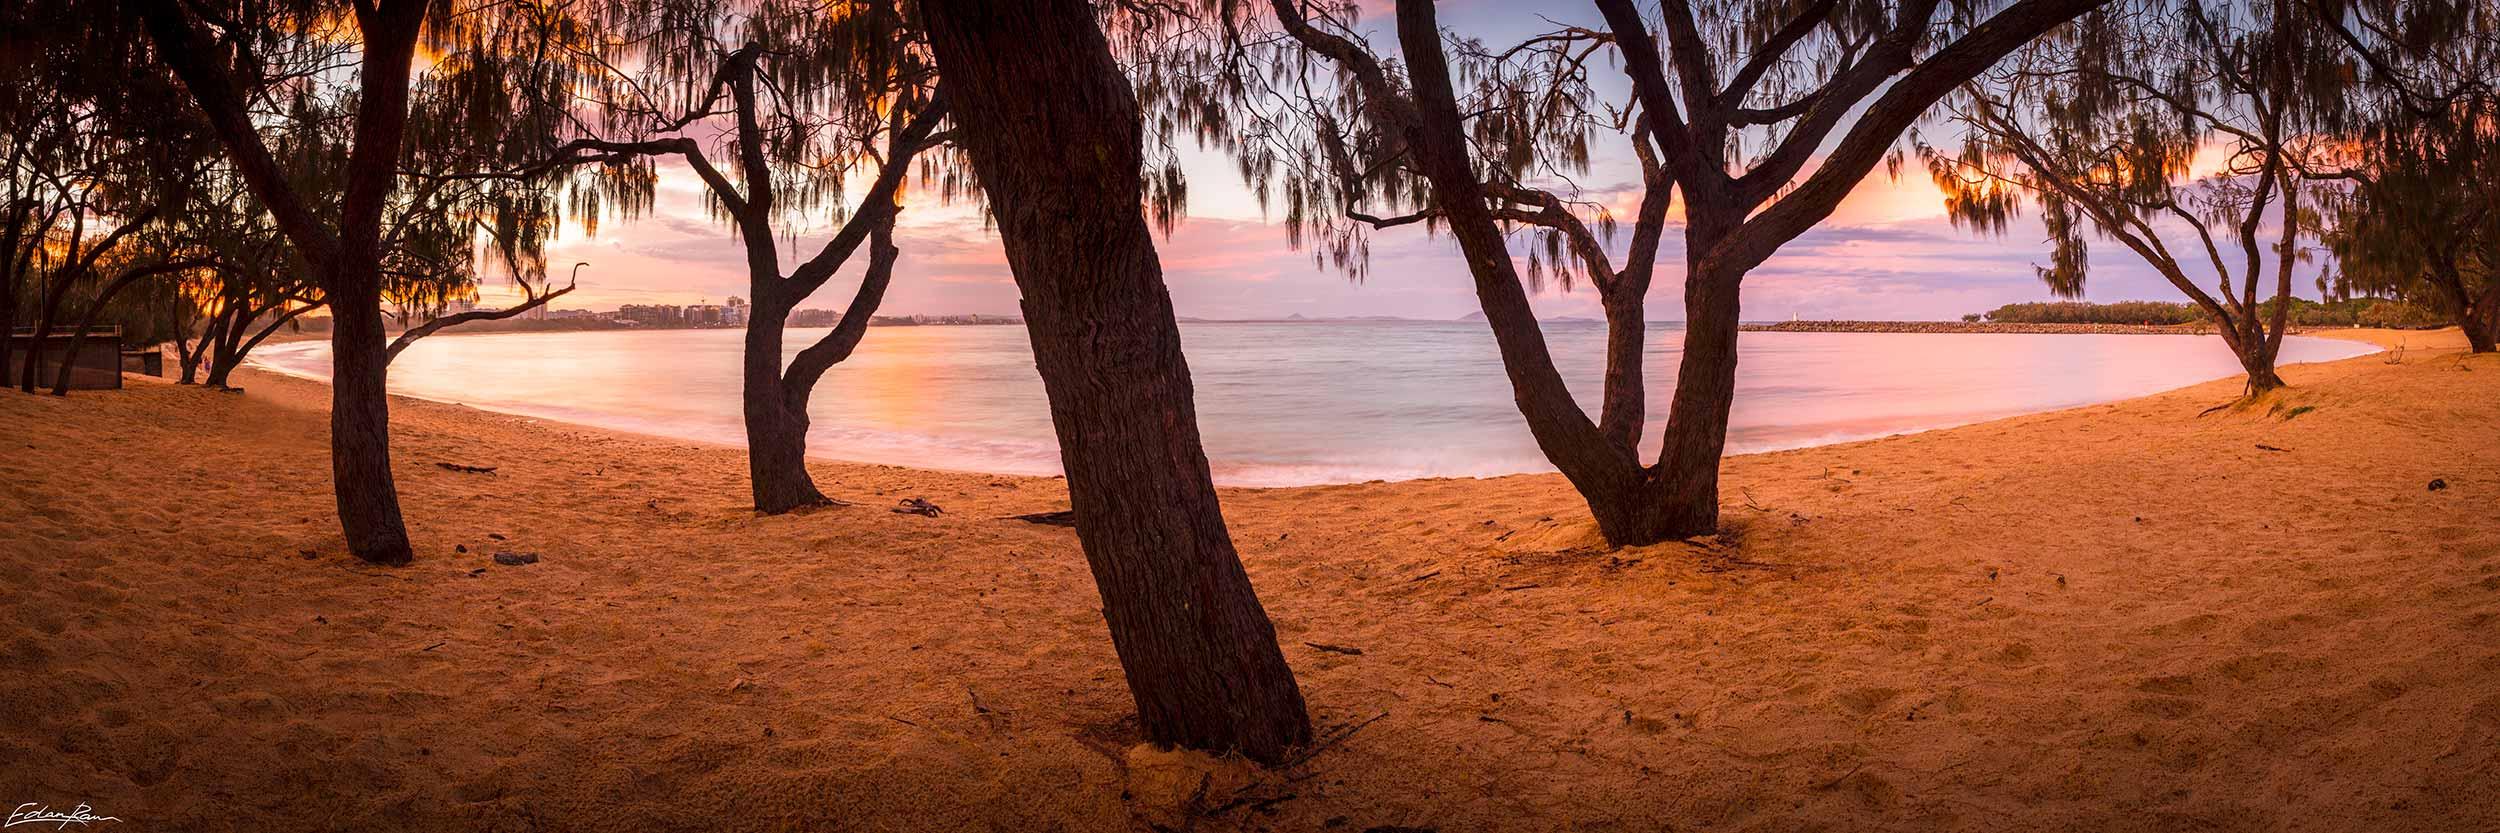 panoramic landscape photographer